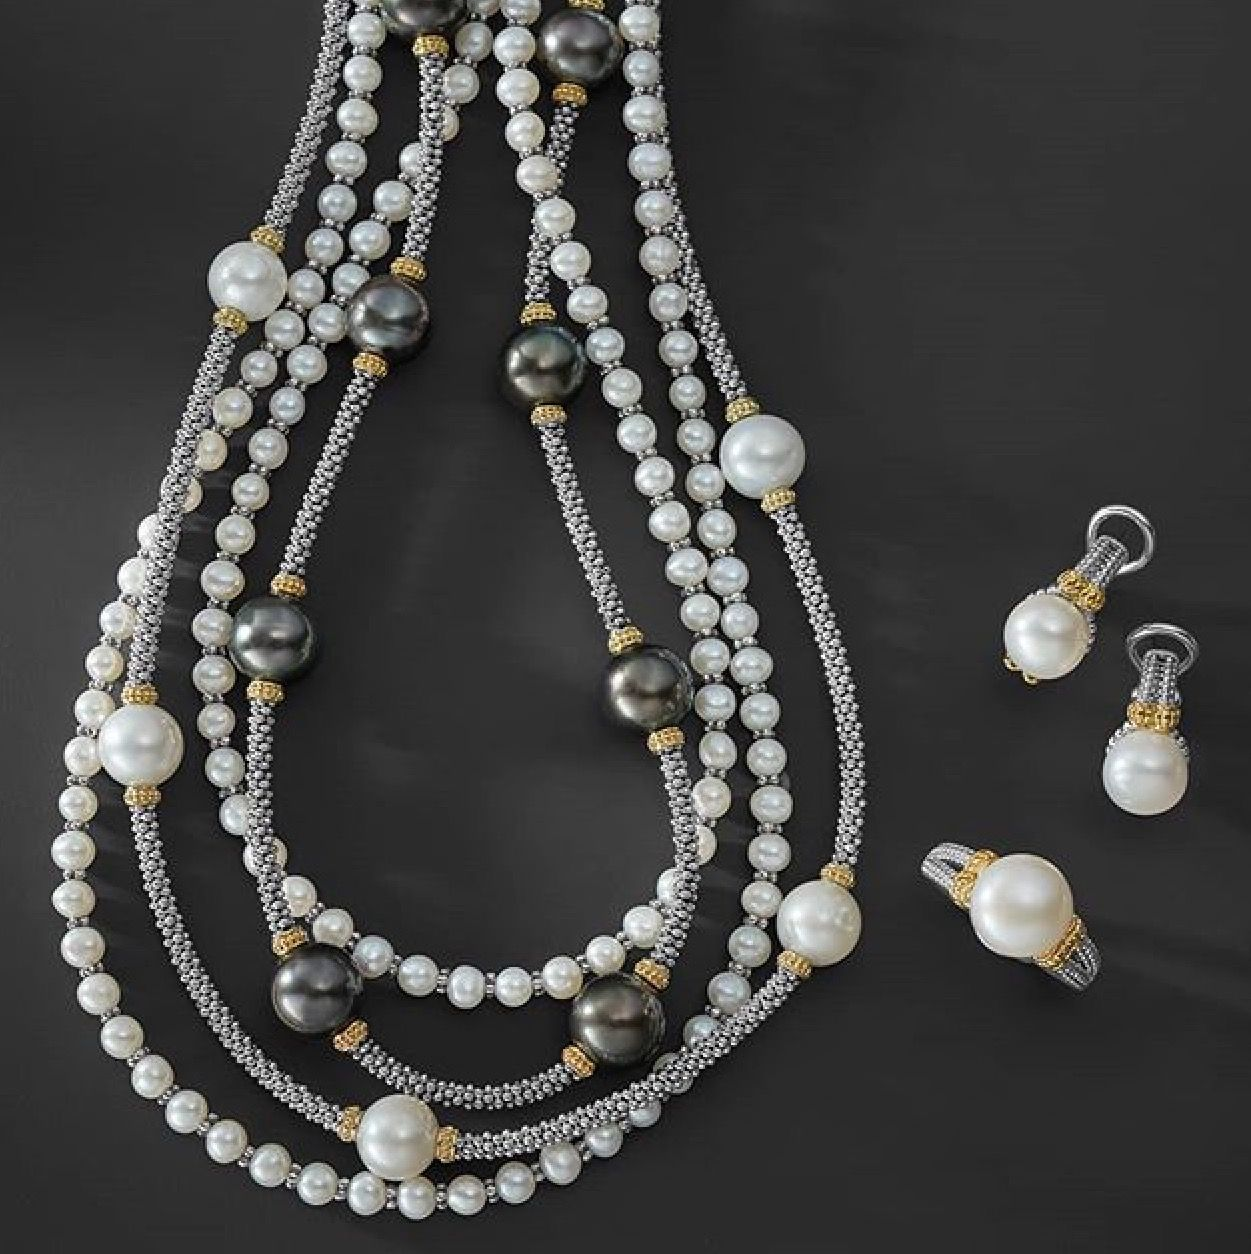 LAGOS JEWELRY Jewelry, Lagos jewelry, Jewelry box